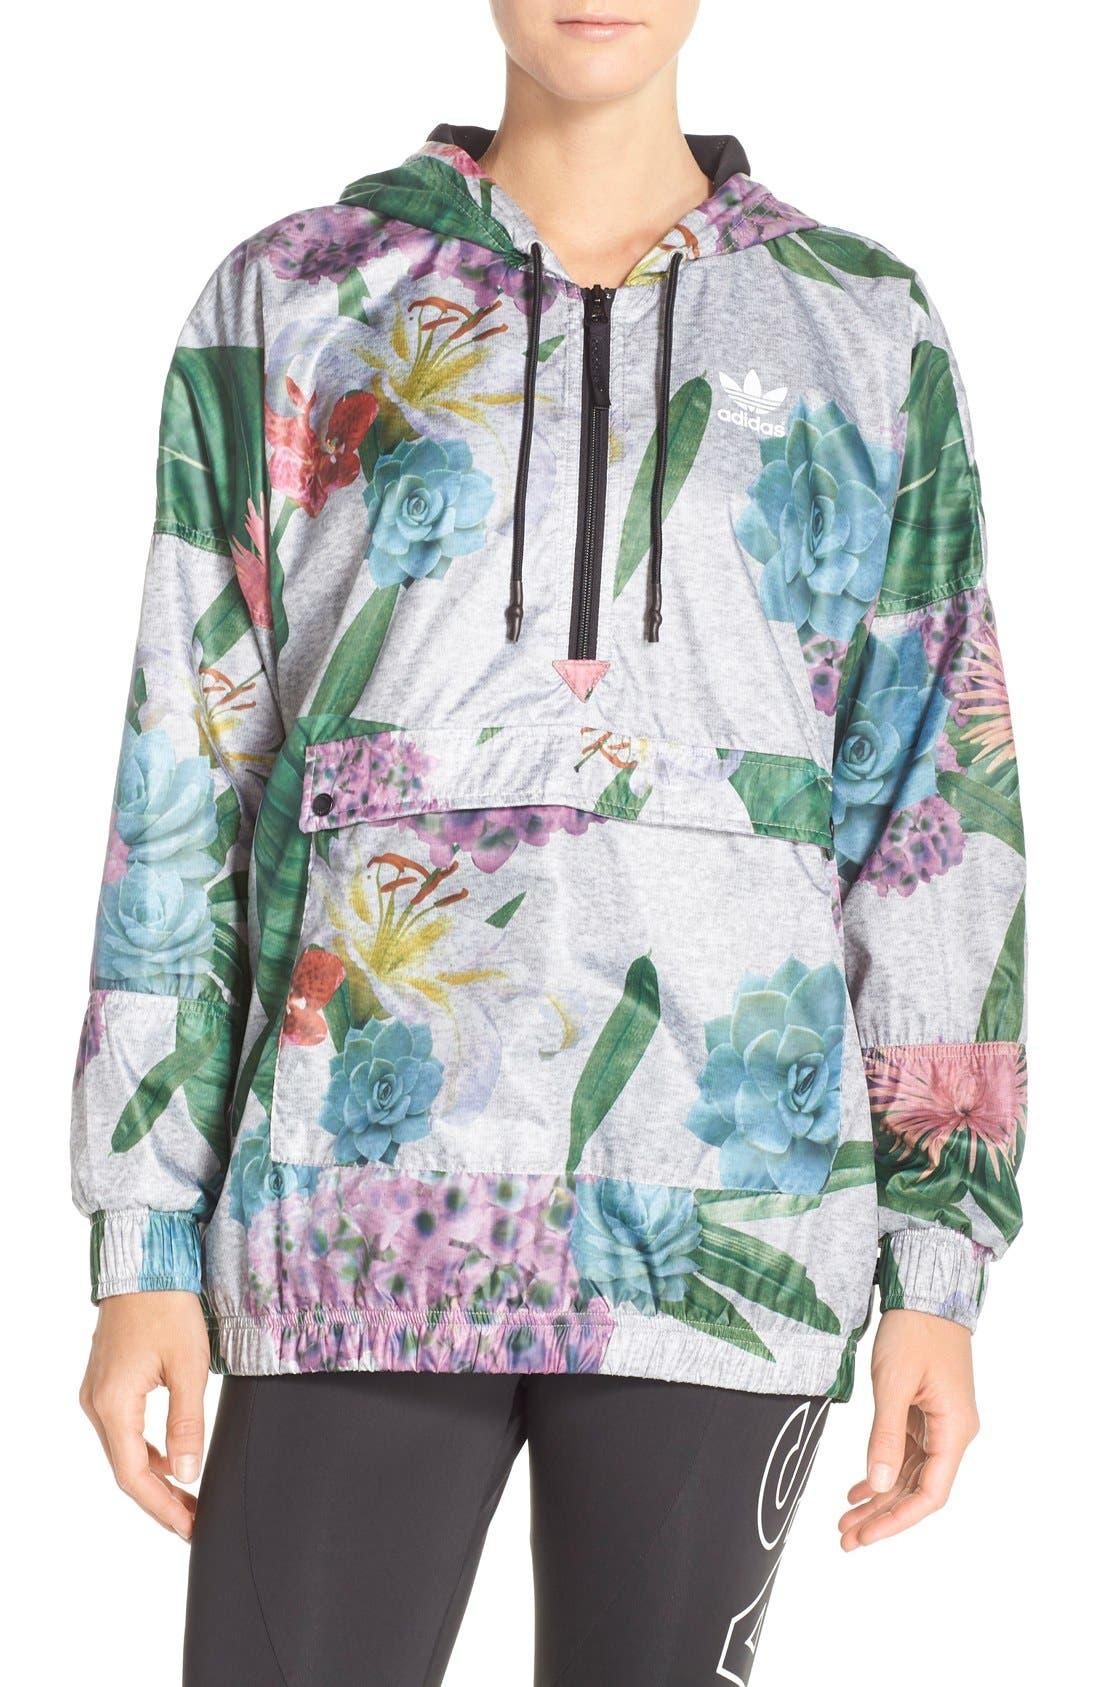 Alternate Image 1 Selected - adidas Originals 'Training' Floral Windbreaker Jacket